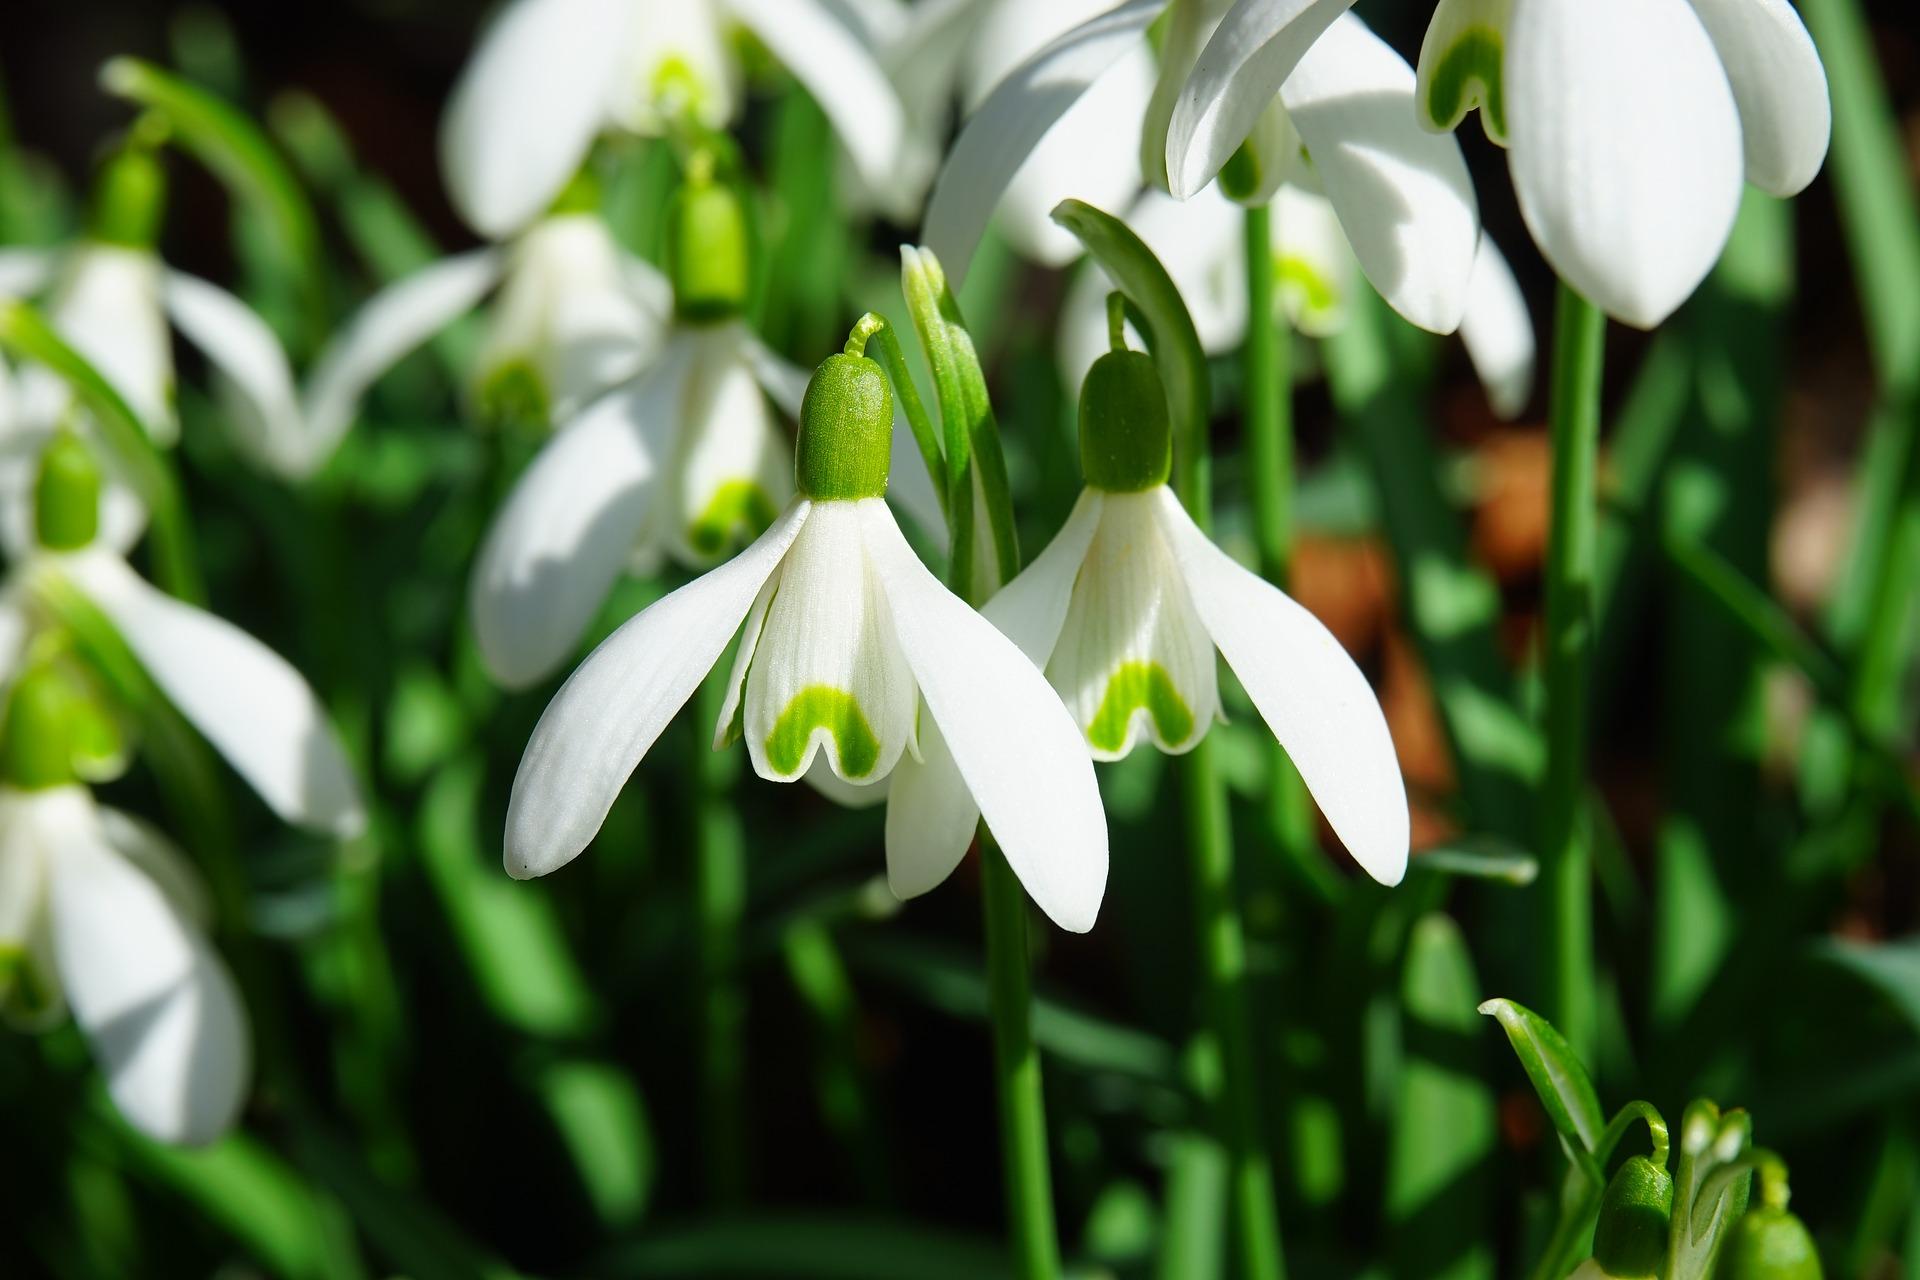 snowdrop-1025050_1920.jpg